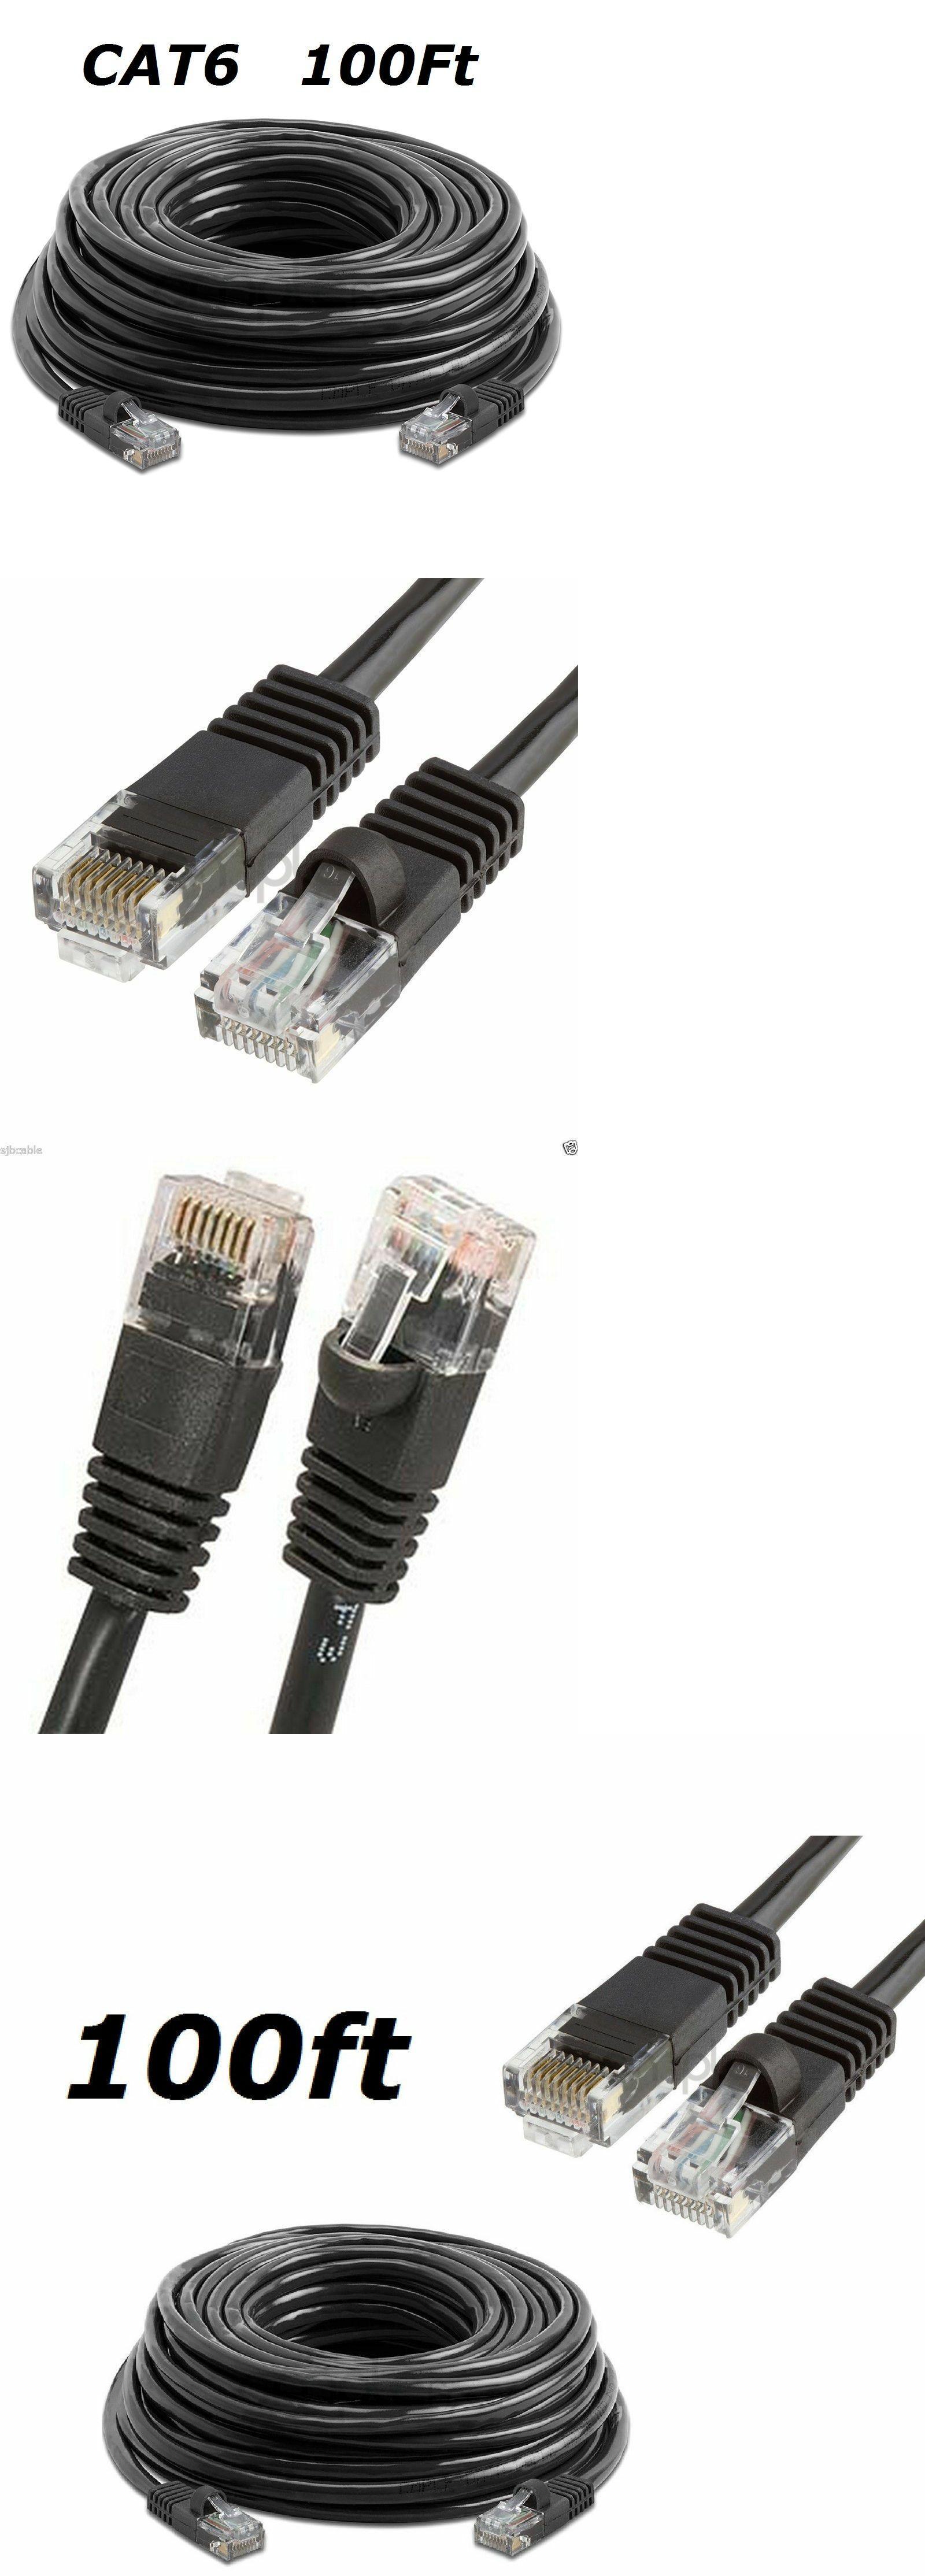 Cat6 100 Ft Black Rj45 Cat6 Ethernet Lan Network Cable